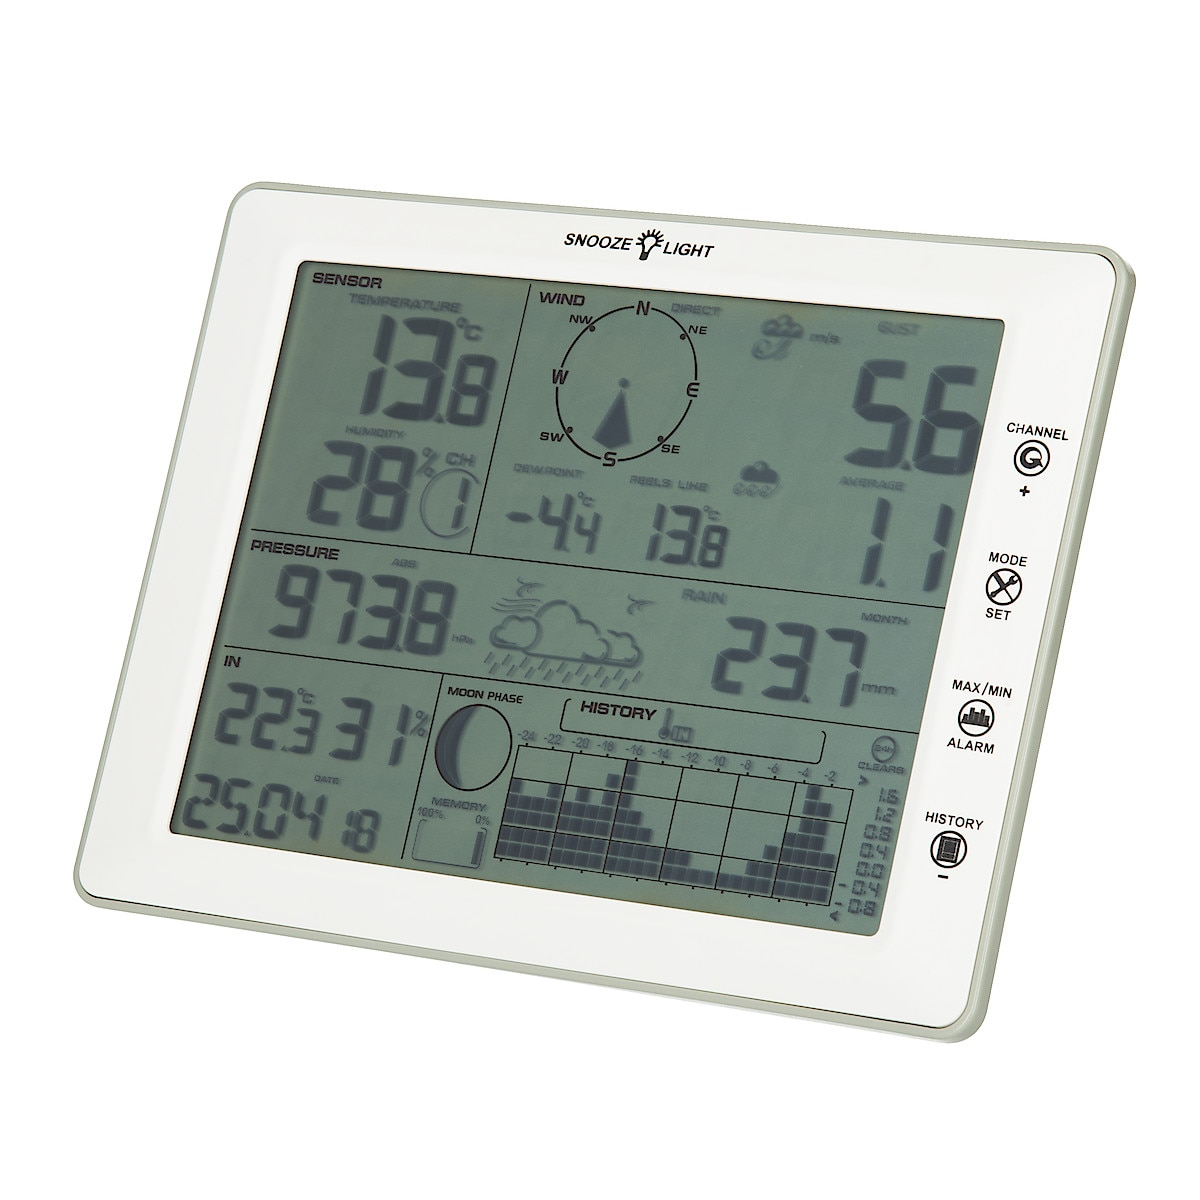 Cotech FT0203 displayenhet